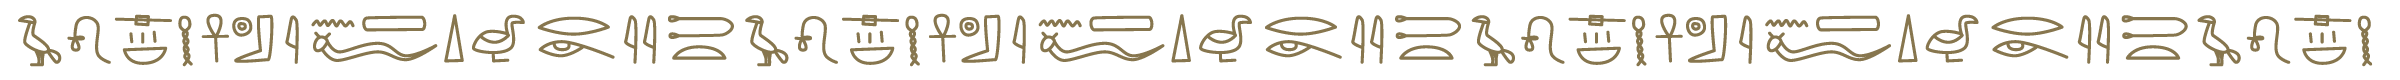 Egyptian_Symbols